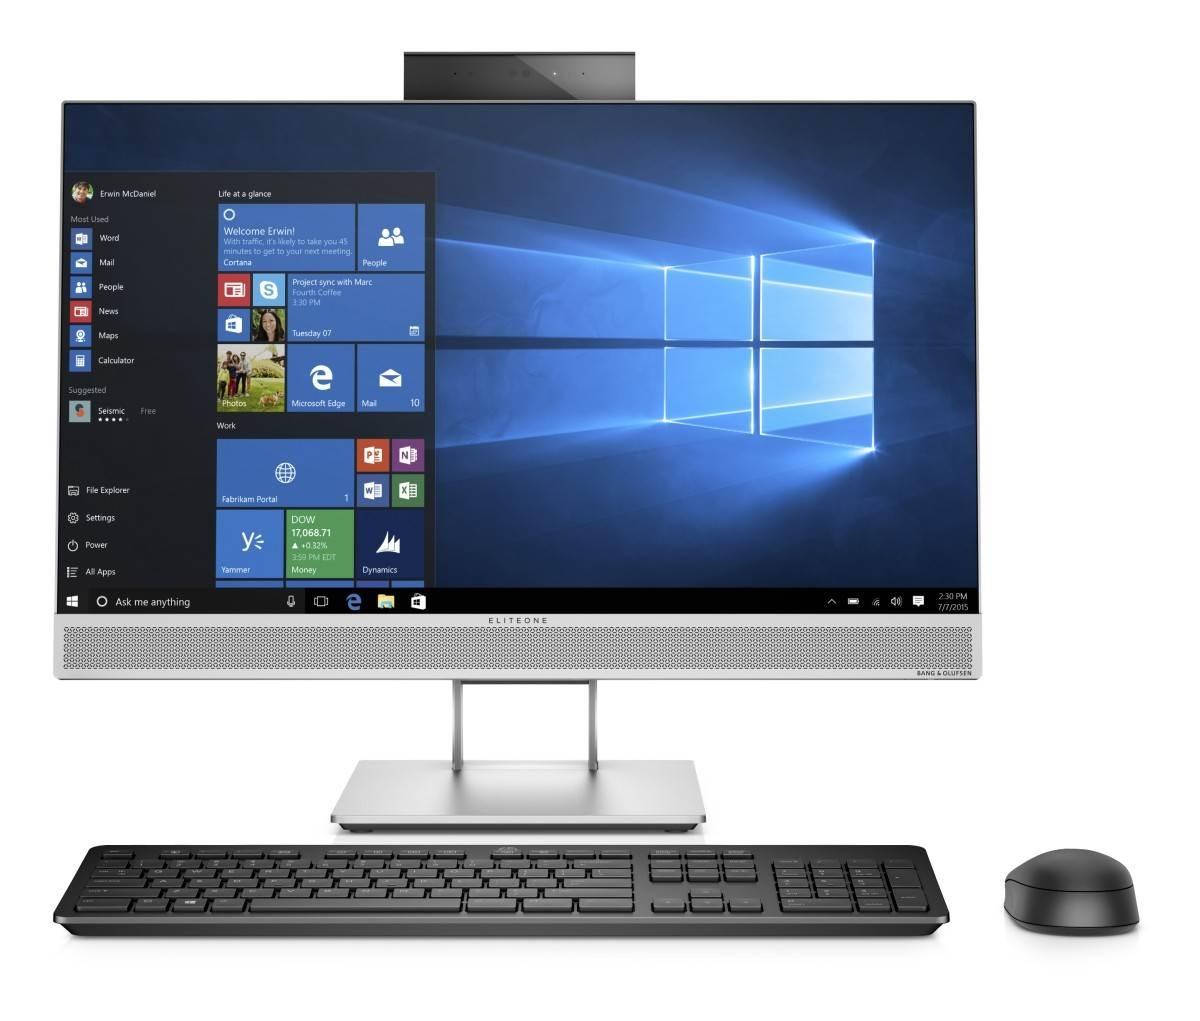 HP EliteOne 800G4 AiO 23.8NT i5-8500,8GB,256GB M.2,WiFi a/b/g/n/ac+BT VPro, wrls kláv. myš,SD MCR,DVDRW,DP+HDMI,Win10Pro